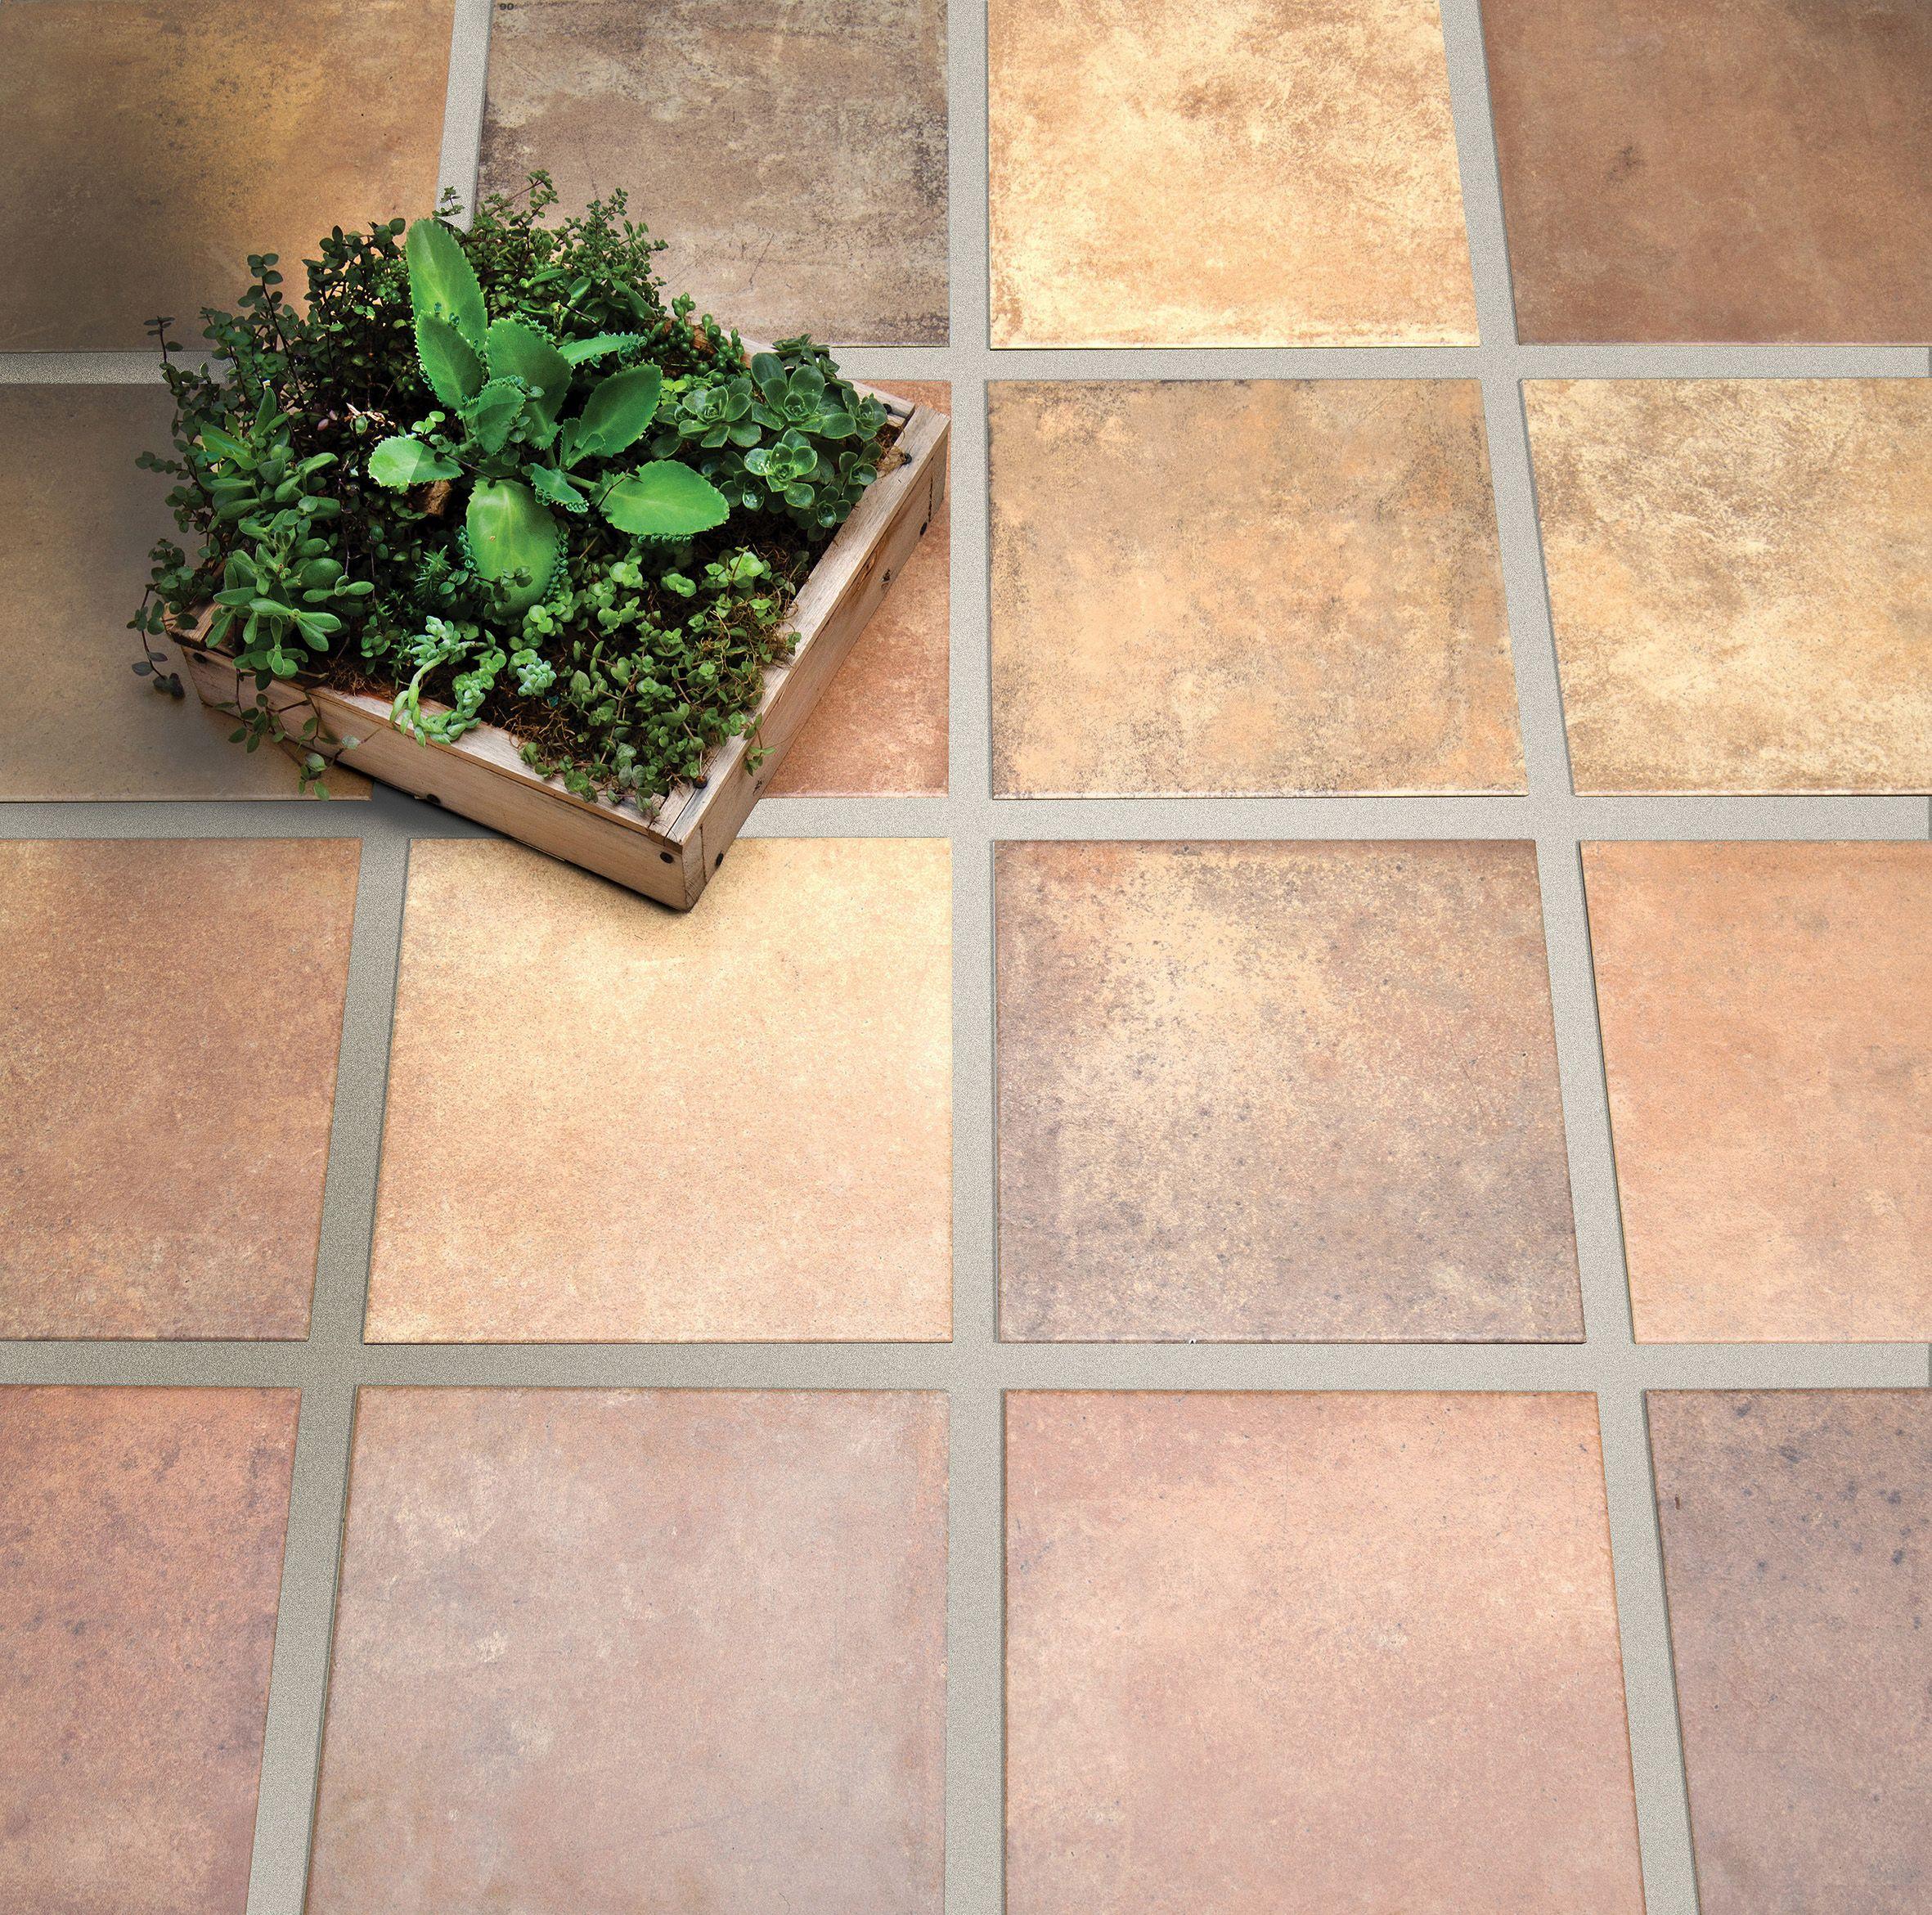 Terre mix ladrillo cer mica san lorenzo porcelanatos for Pisos antideslizantes para exteriores